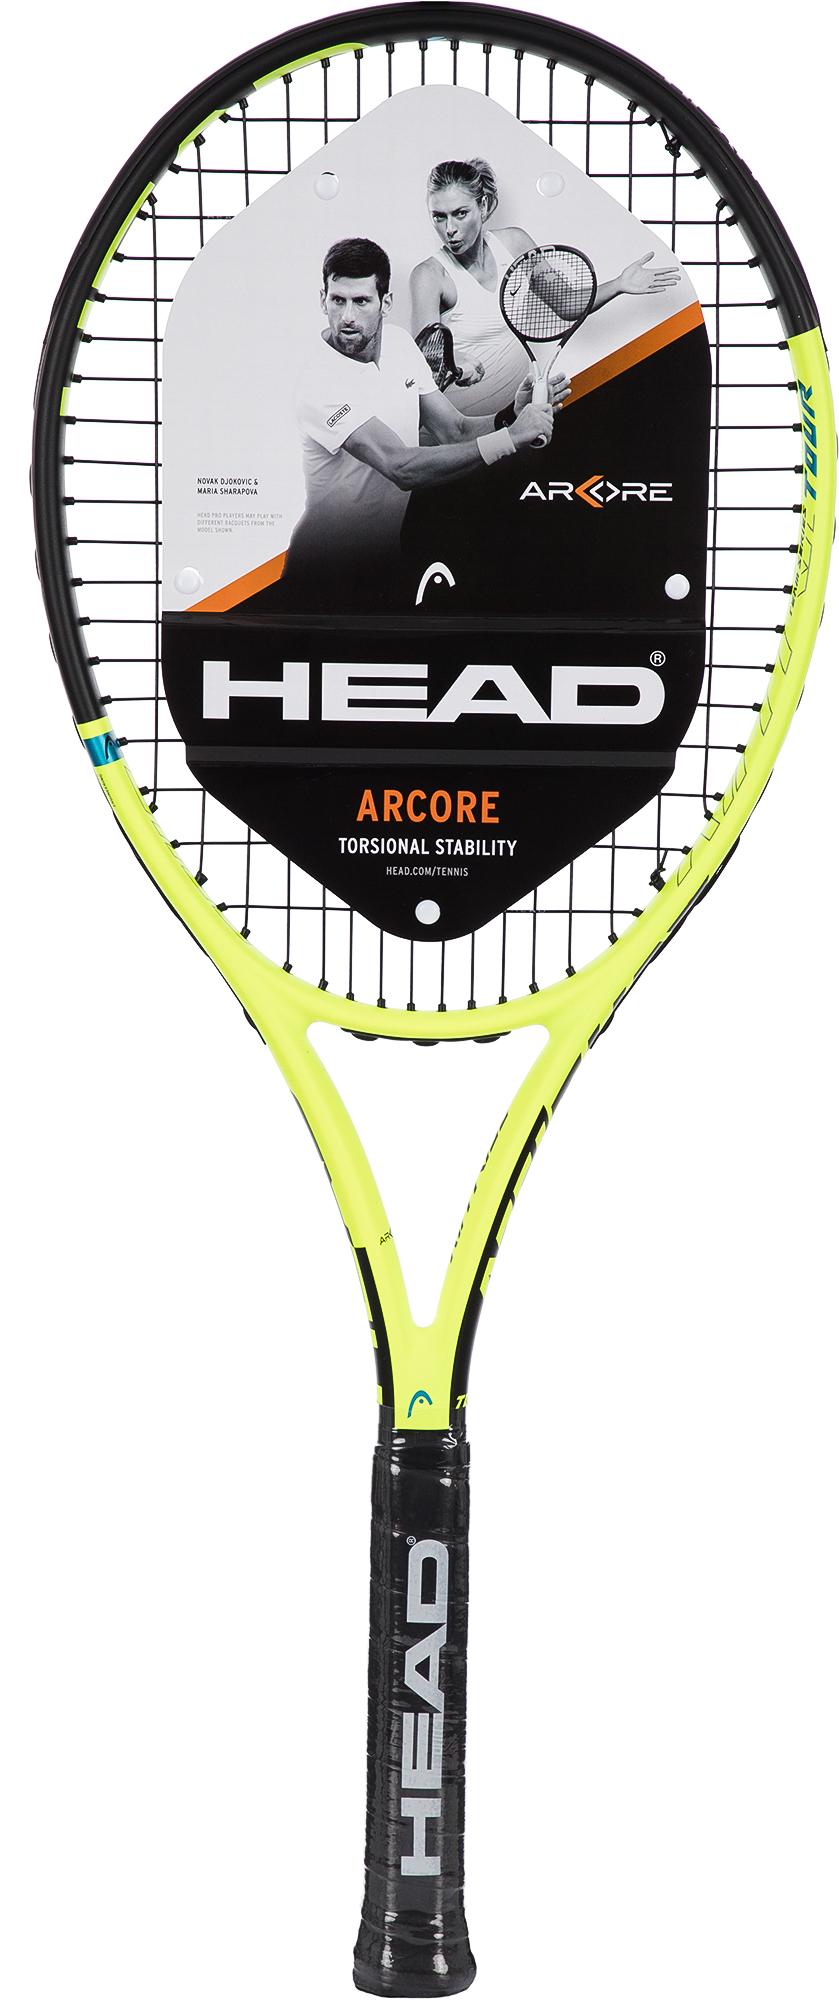 Head Ракетка для большого тенниса Head MX Attitude Tour 27 head ракетка для большого тенниса head graphene 360 speed lite 27